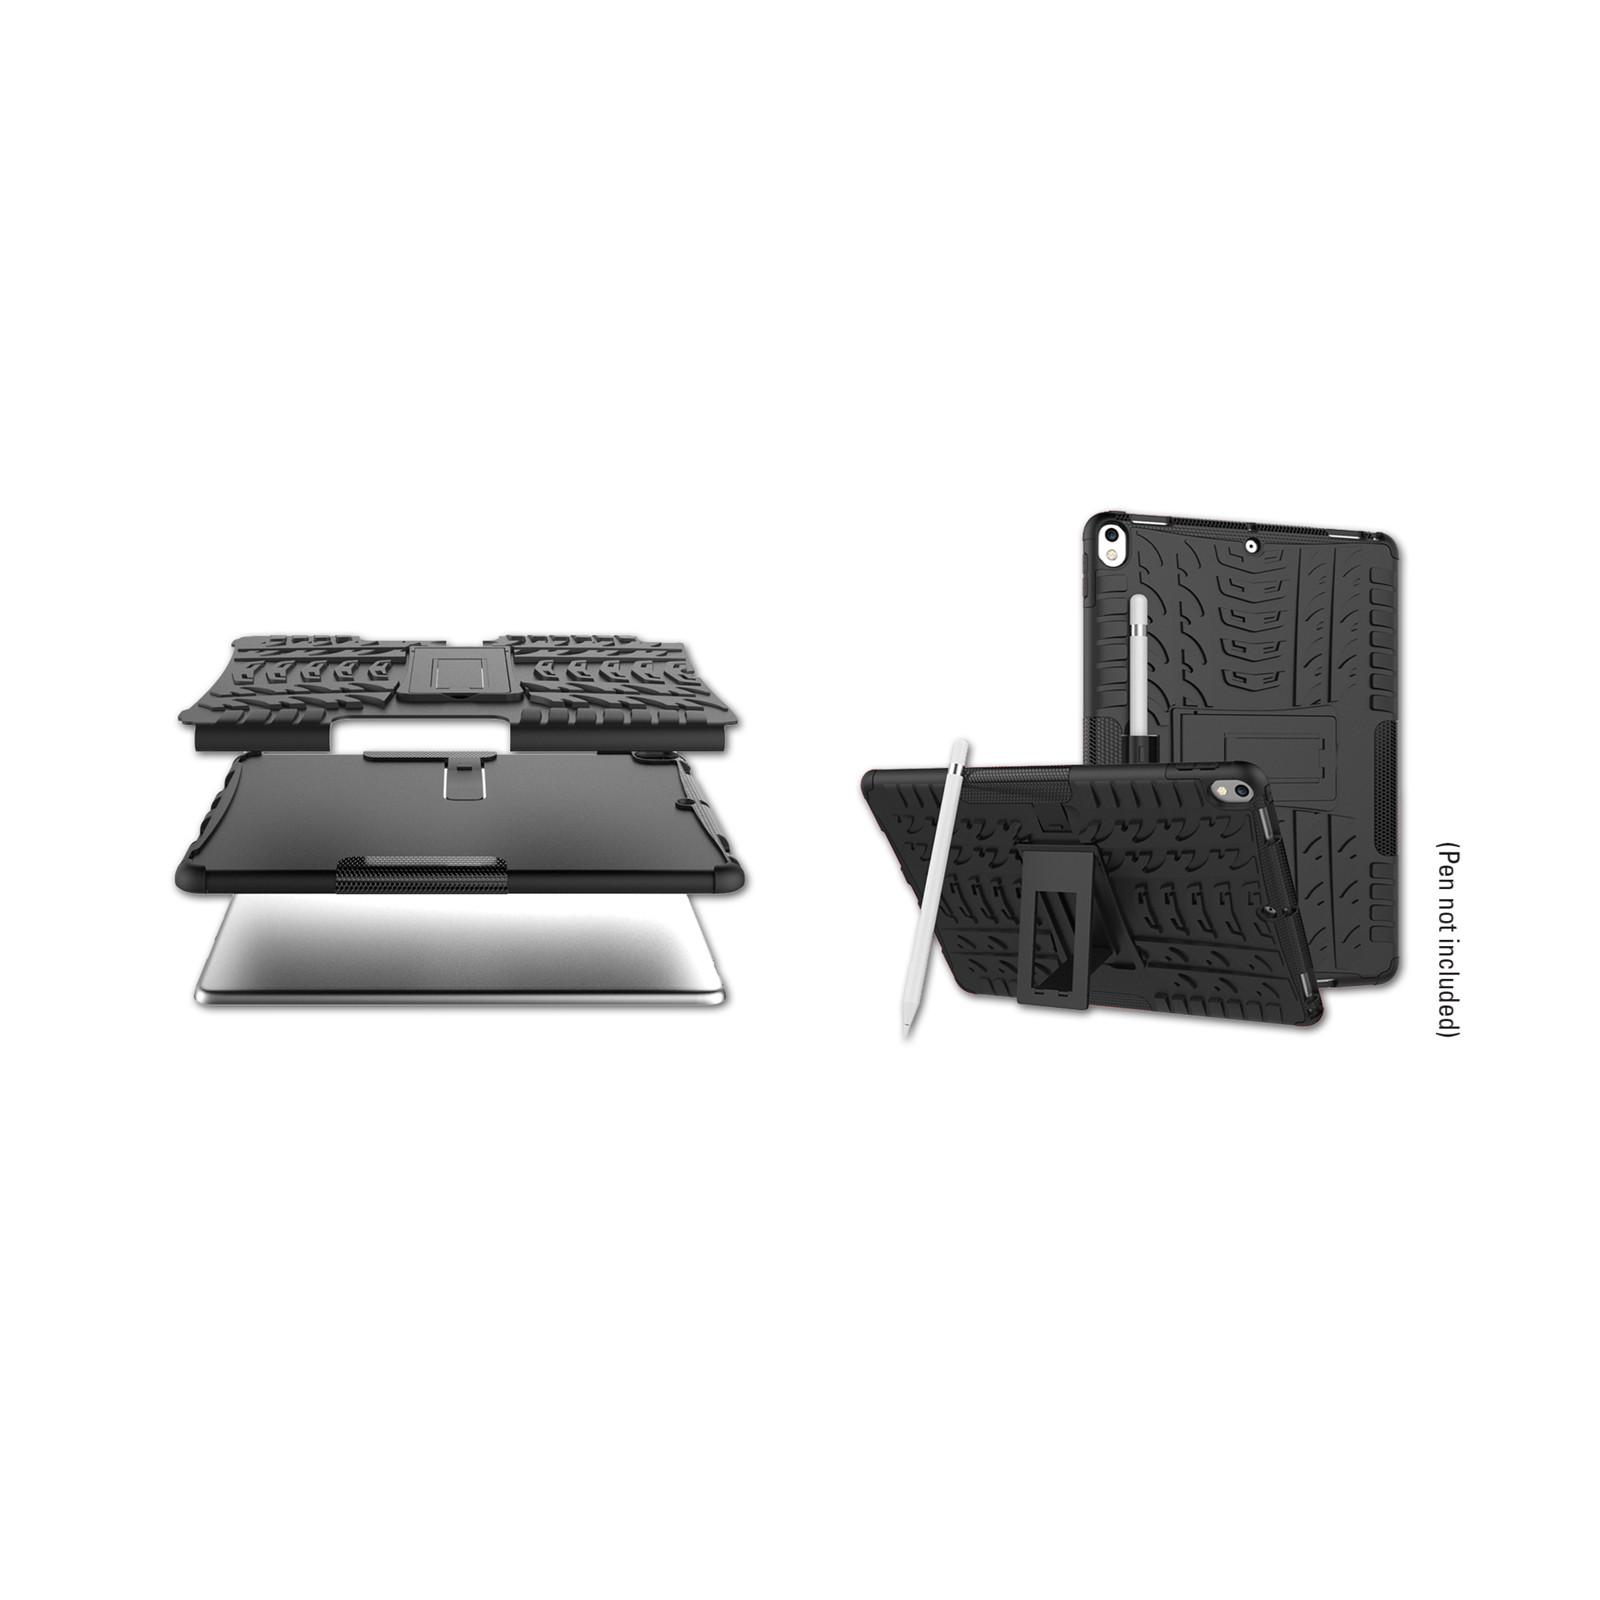 Sandberg iPad Air ActionCase, Black